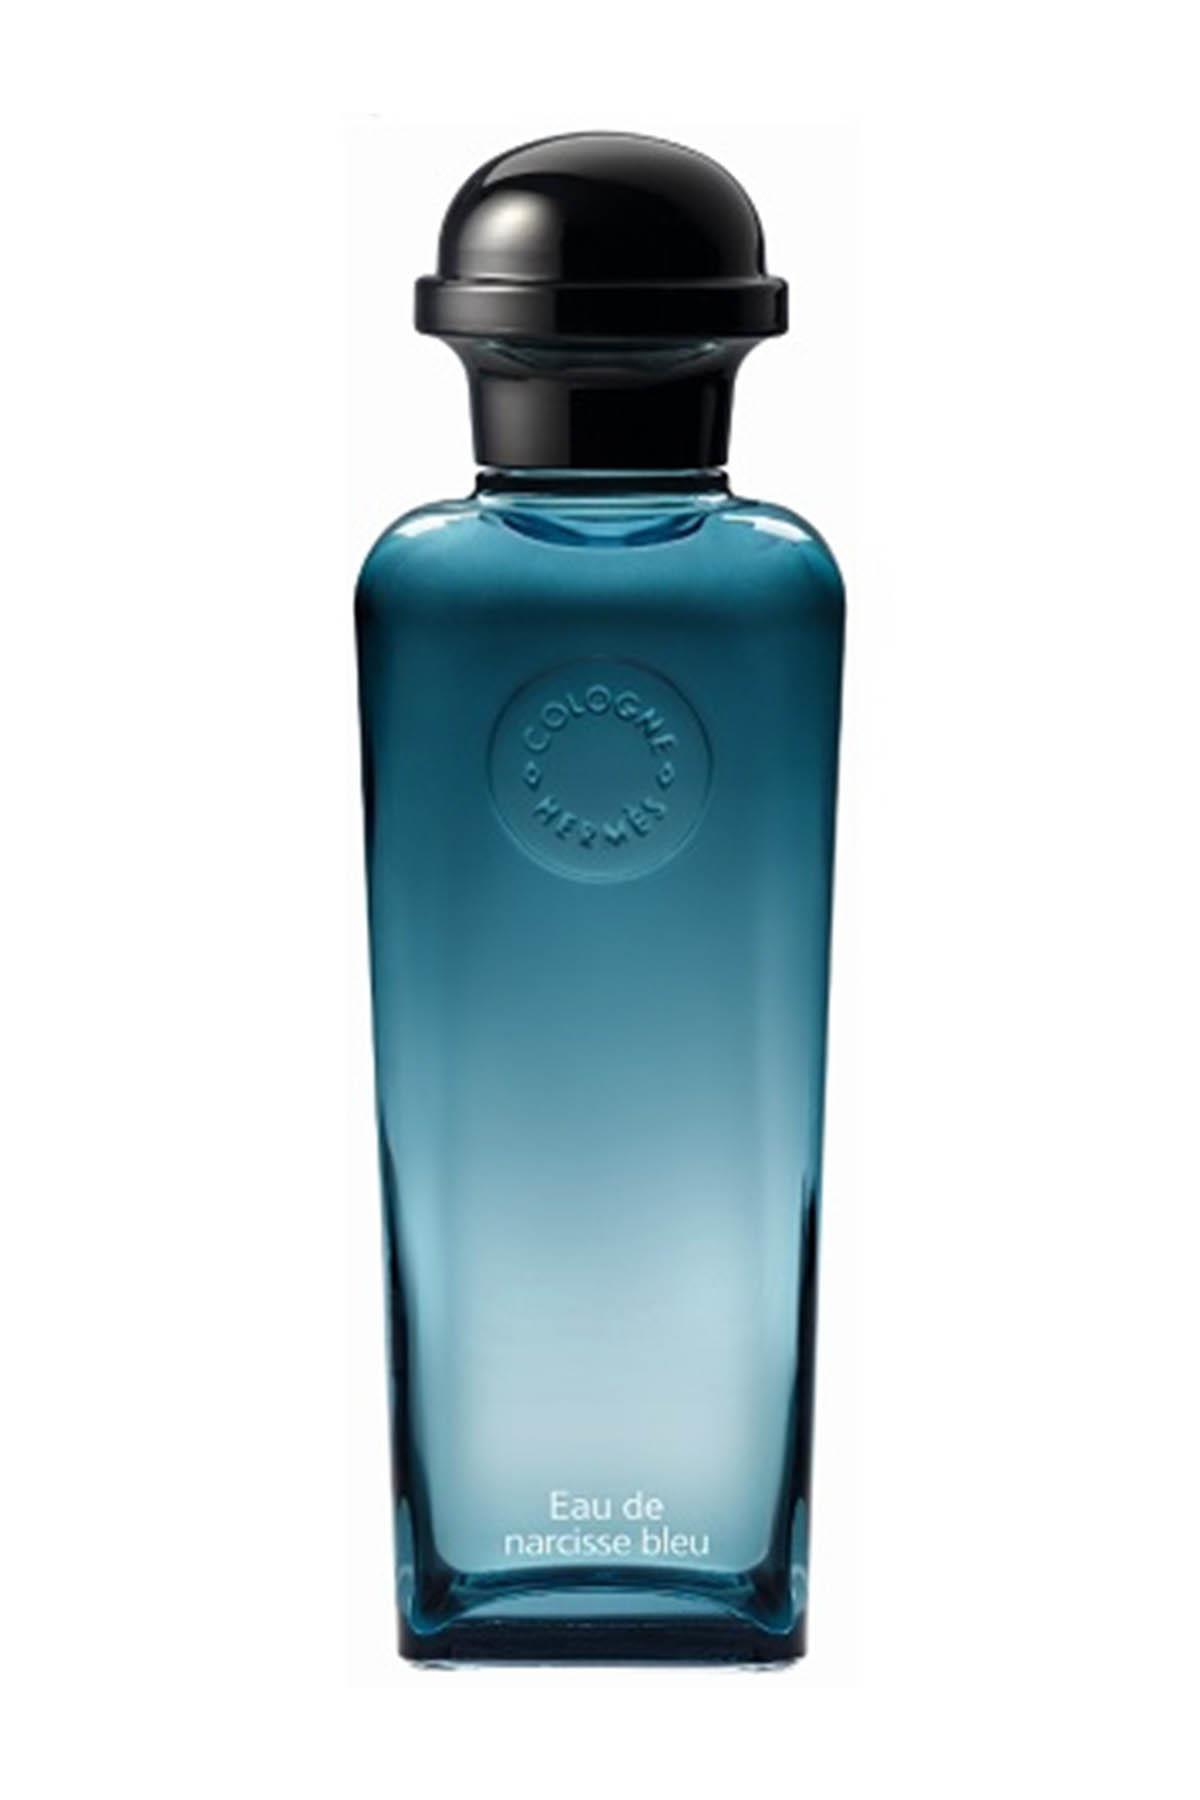 Hermes Eau De Narcisse Bleu EDC 200 ml